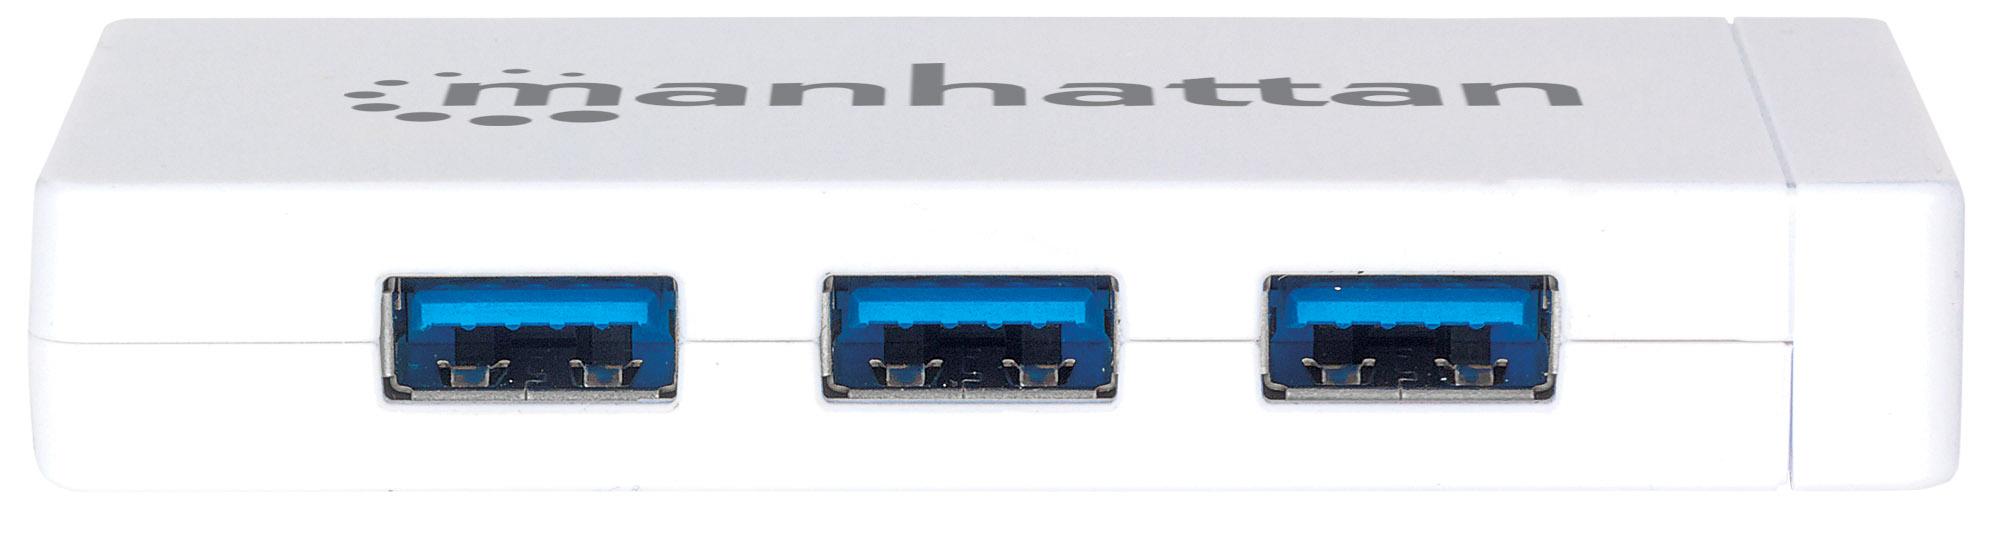 3-Port USB 3.0 Hub with Gigabit Ethernet Adapter